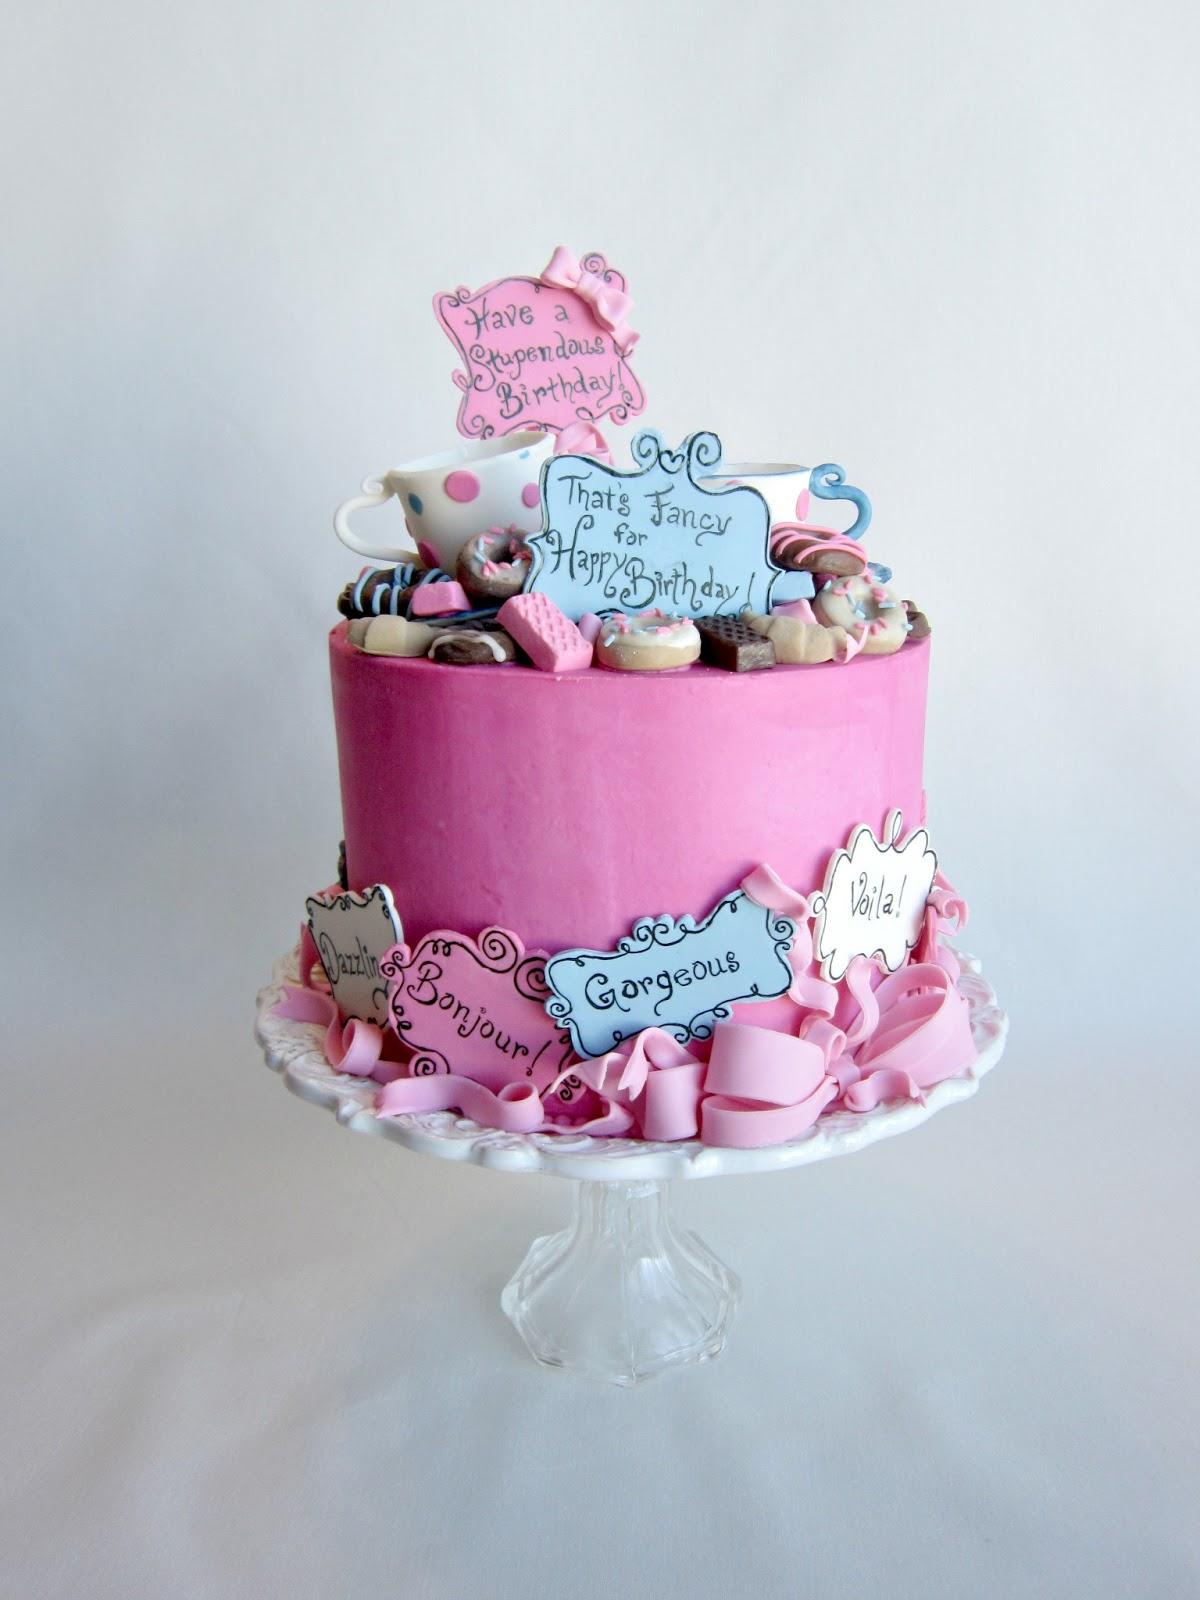 Chocolate Cake Flavored Gum